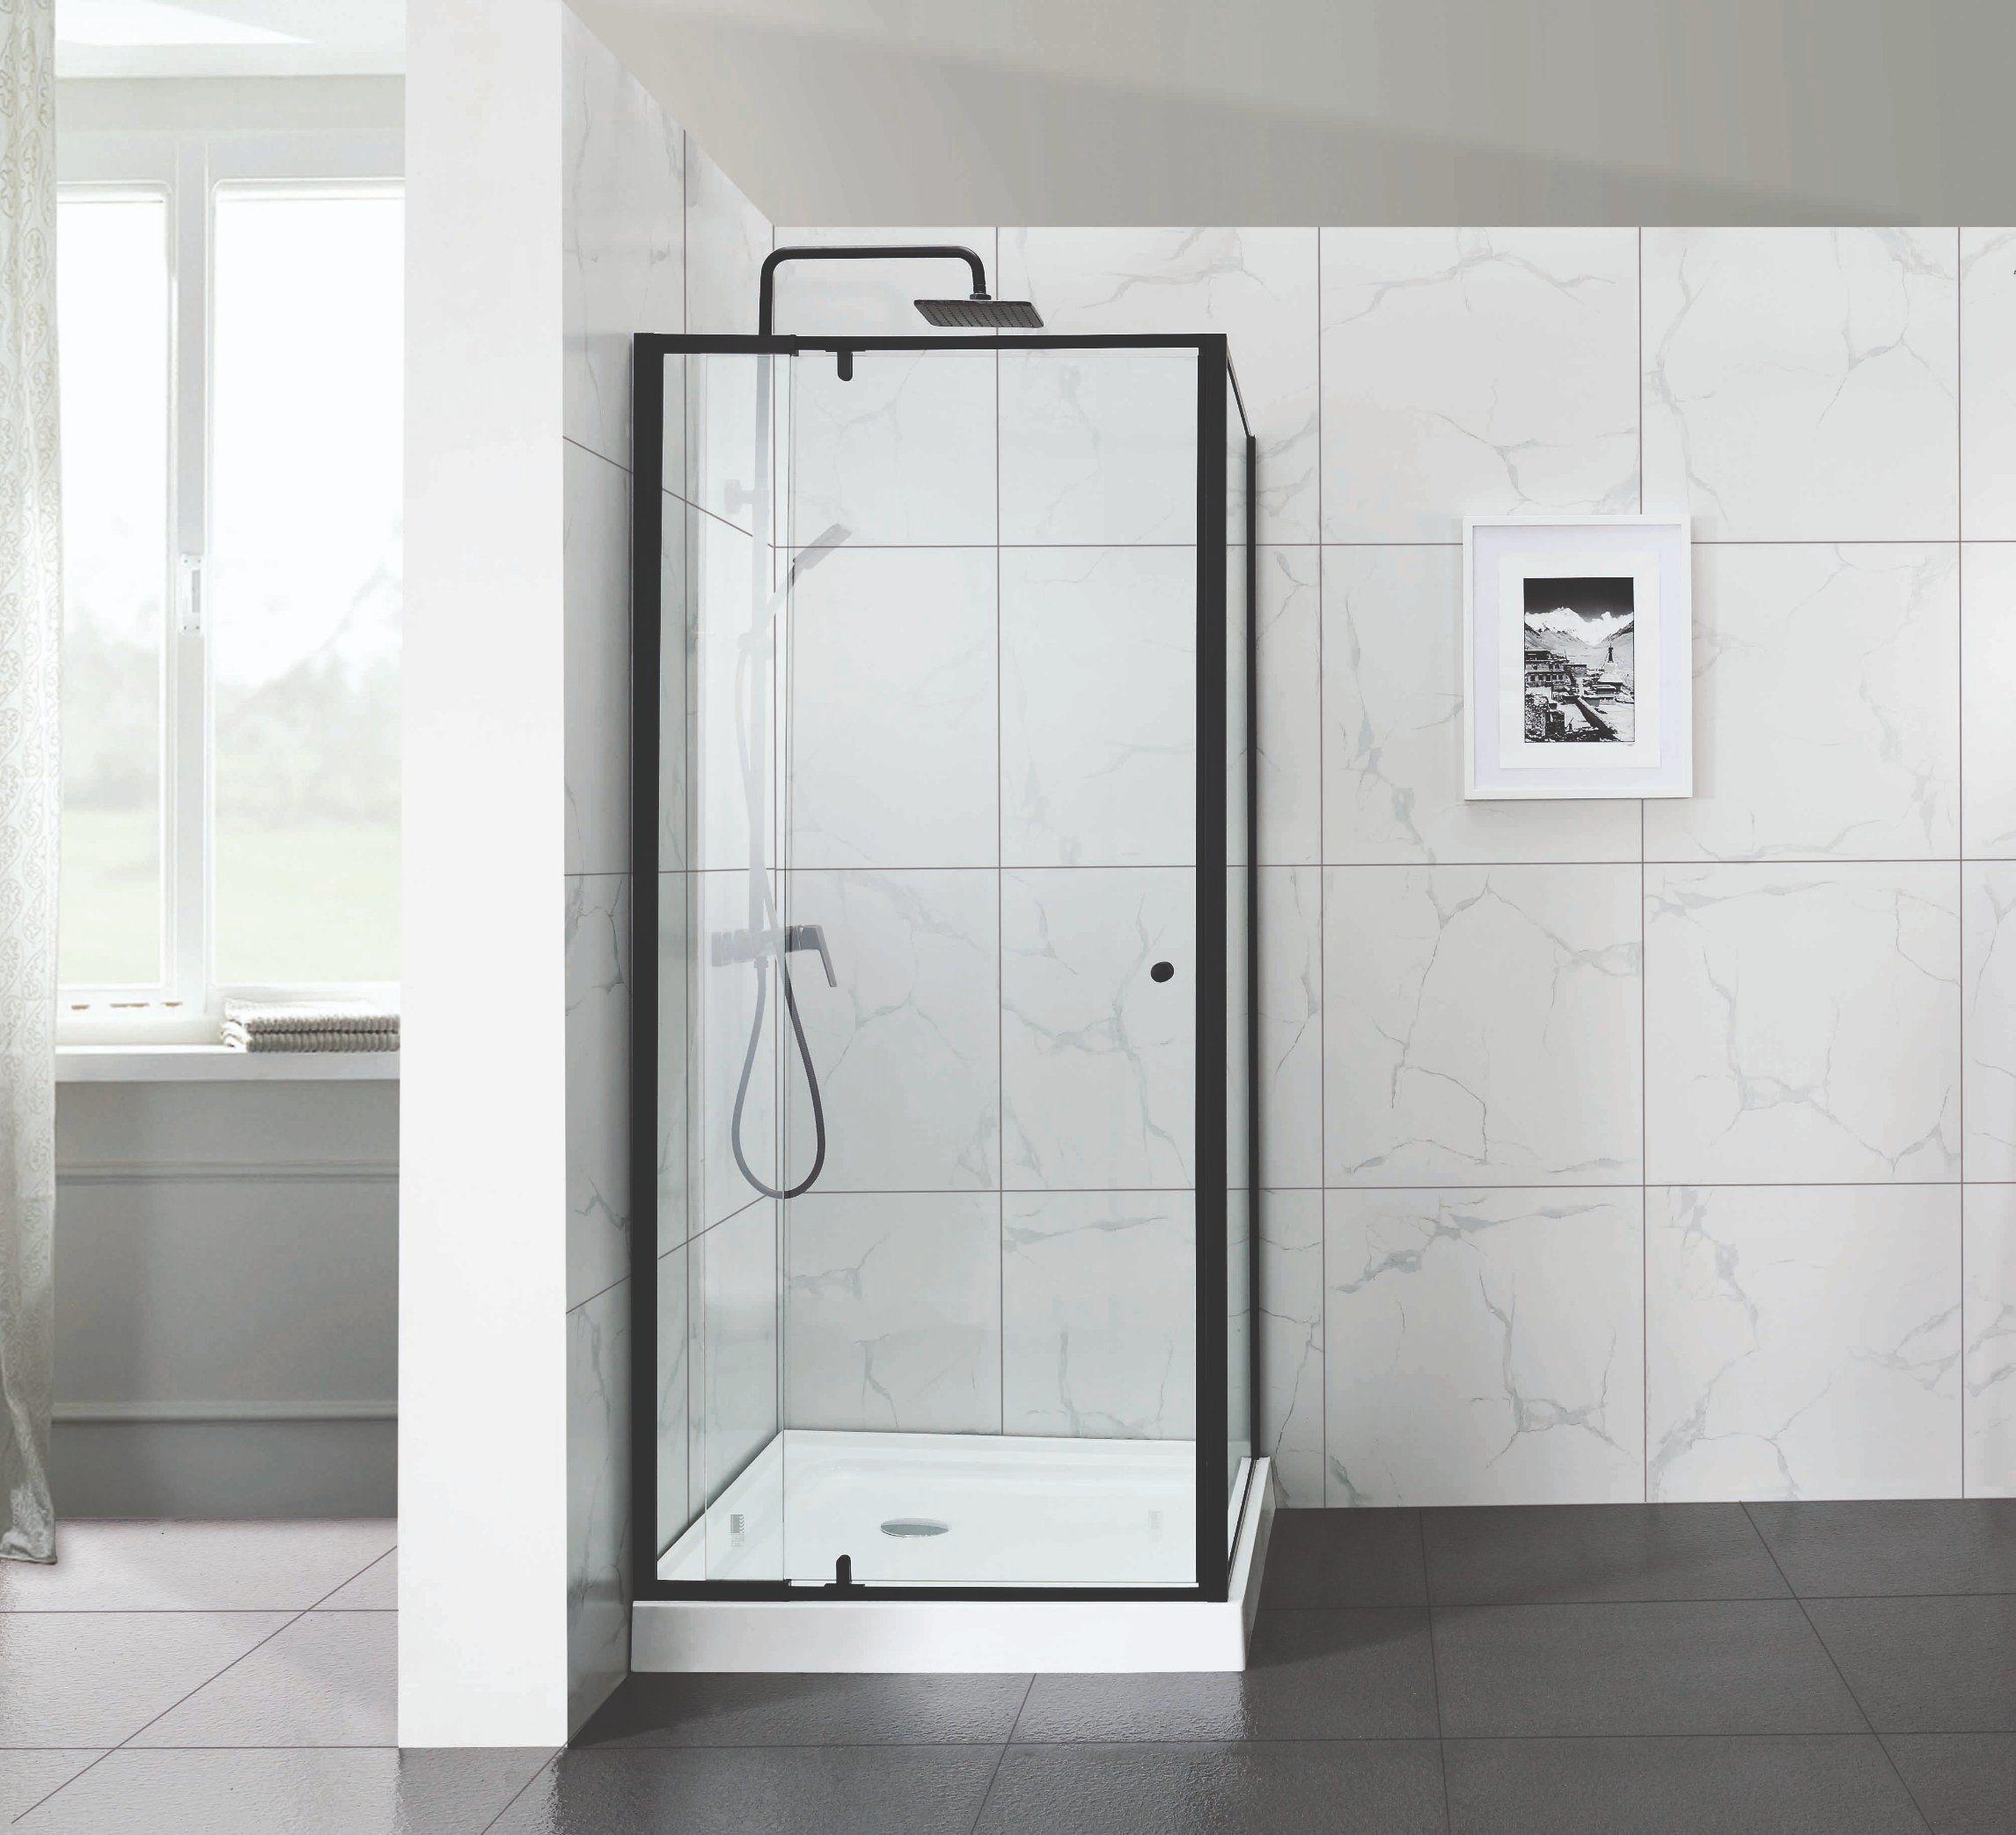 Hot Item Wide Adjustment Matt Black Ss Pivot Shower Door For Commercial Project